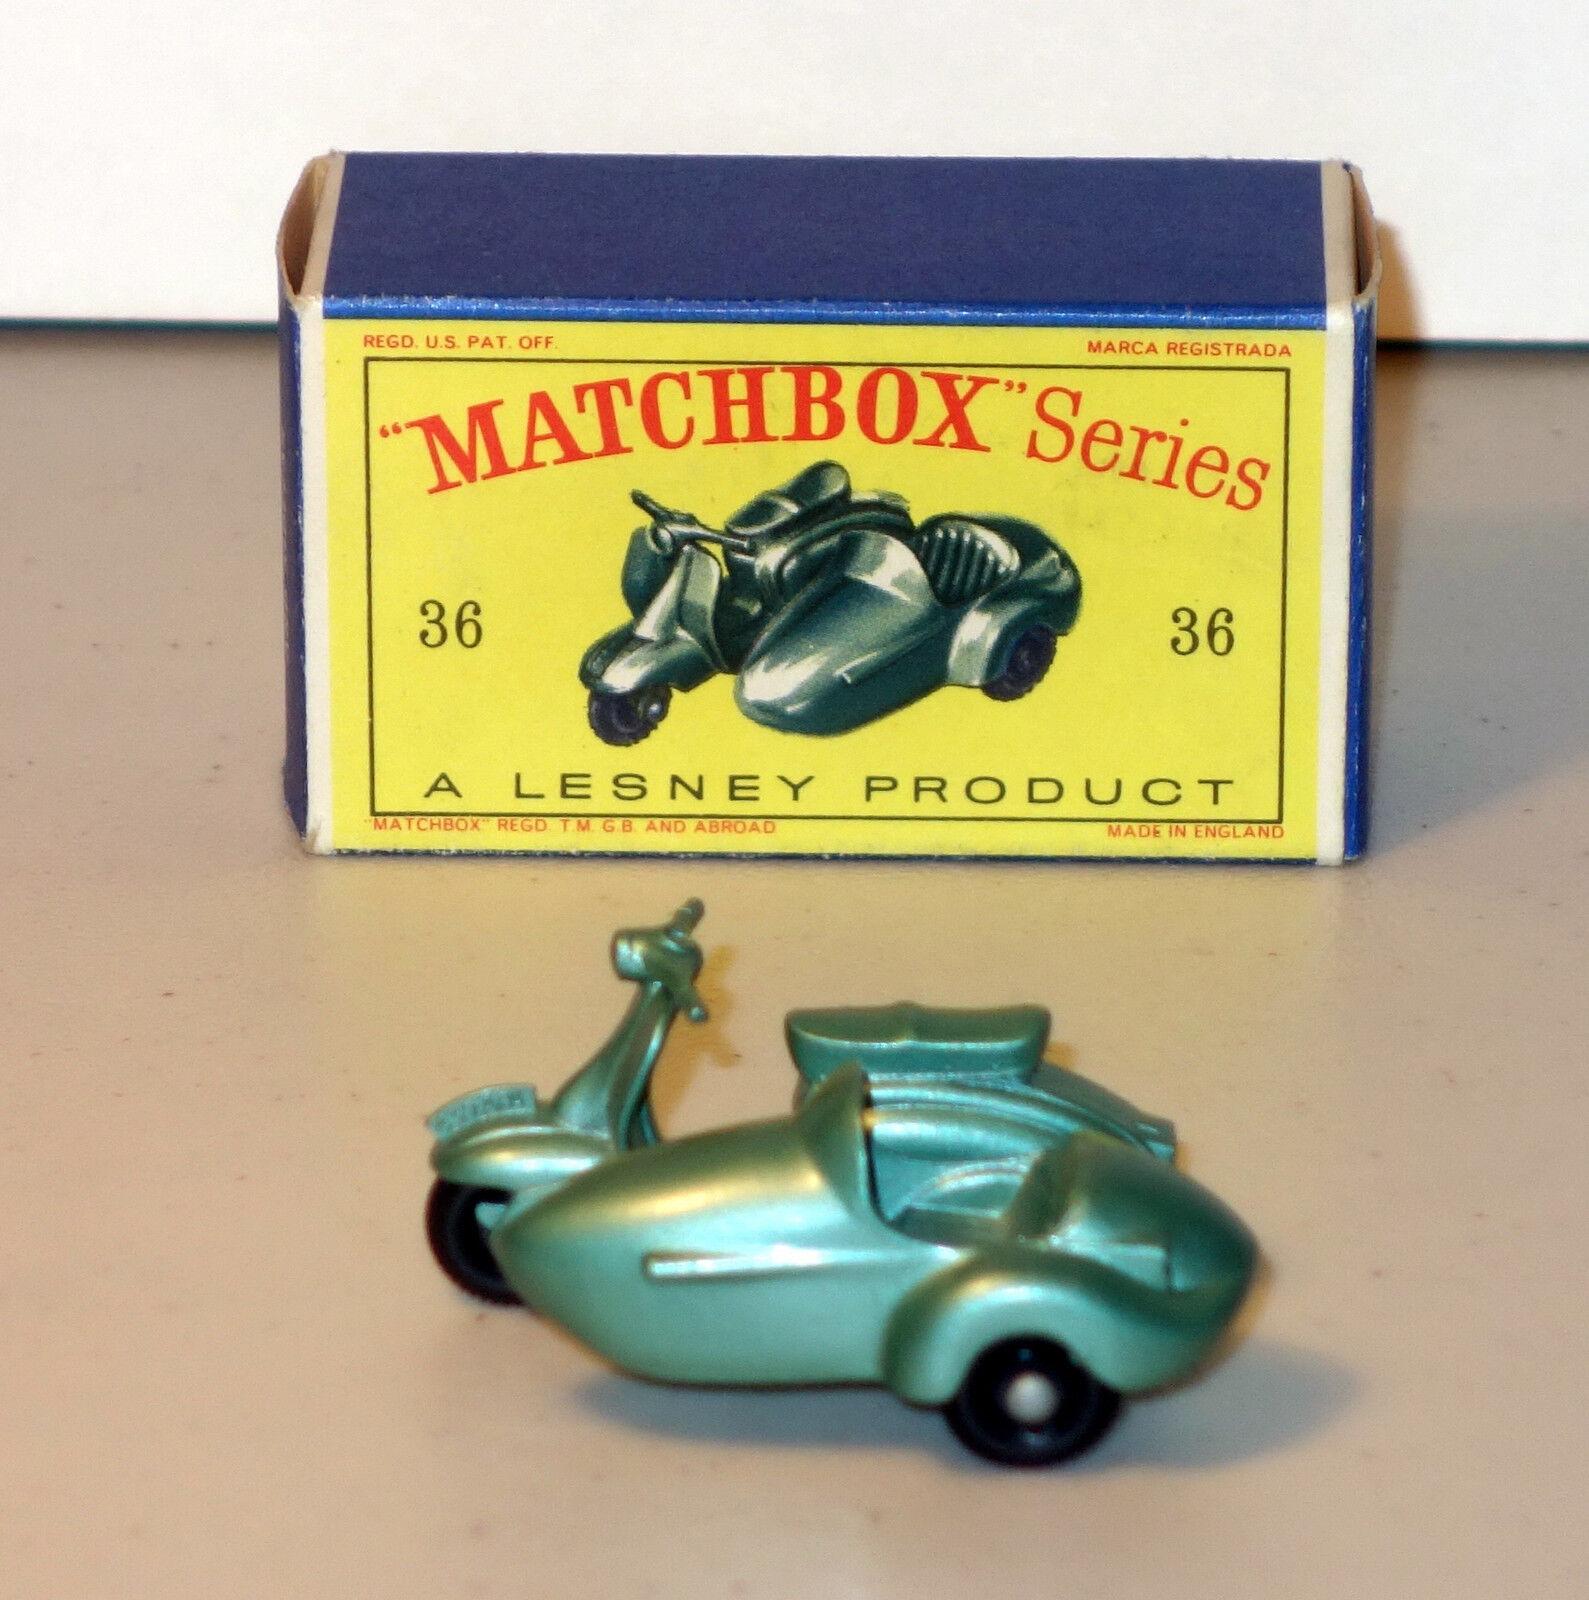 servicio considerado DTE Lesney Matchbox Matchbox Matchbox Regular ruedas 36-2 Lambretta Scooter & SideCoche con fino agua peptonada tamponada  apresurado a ver